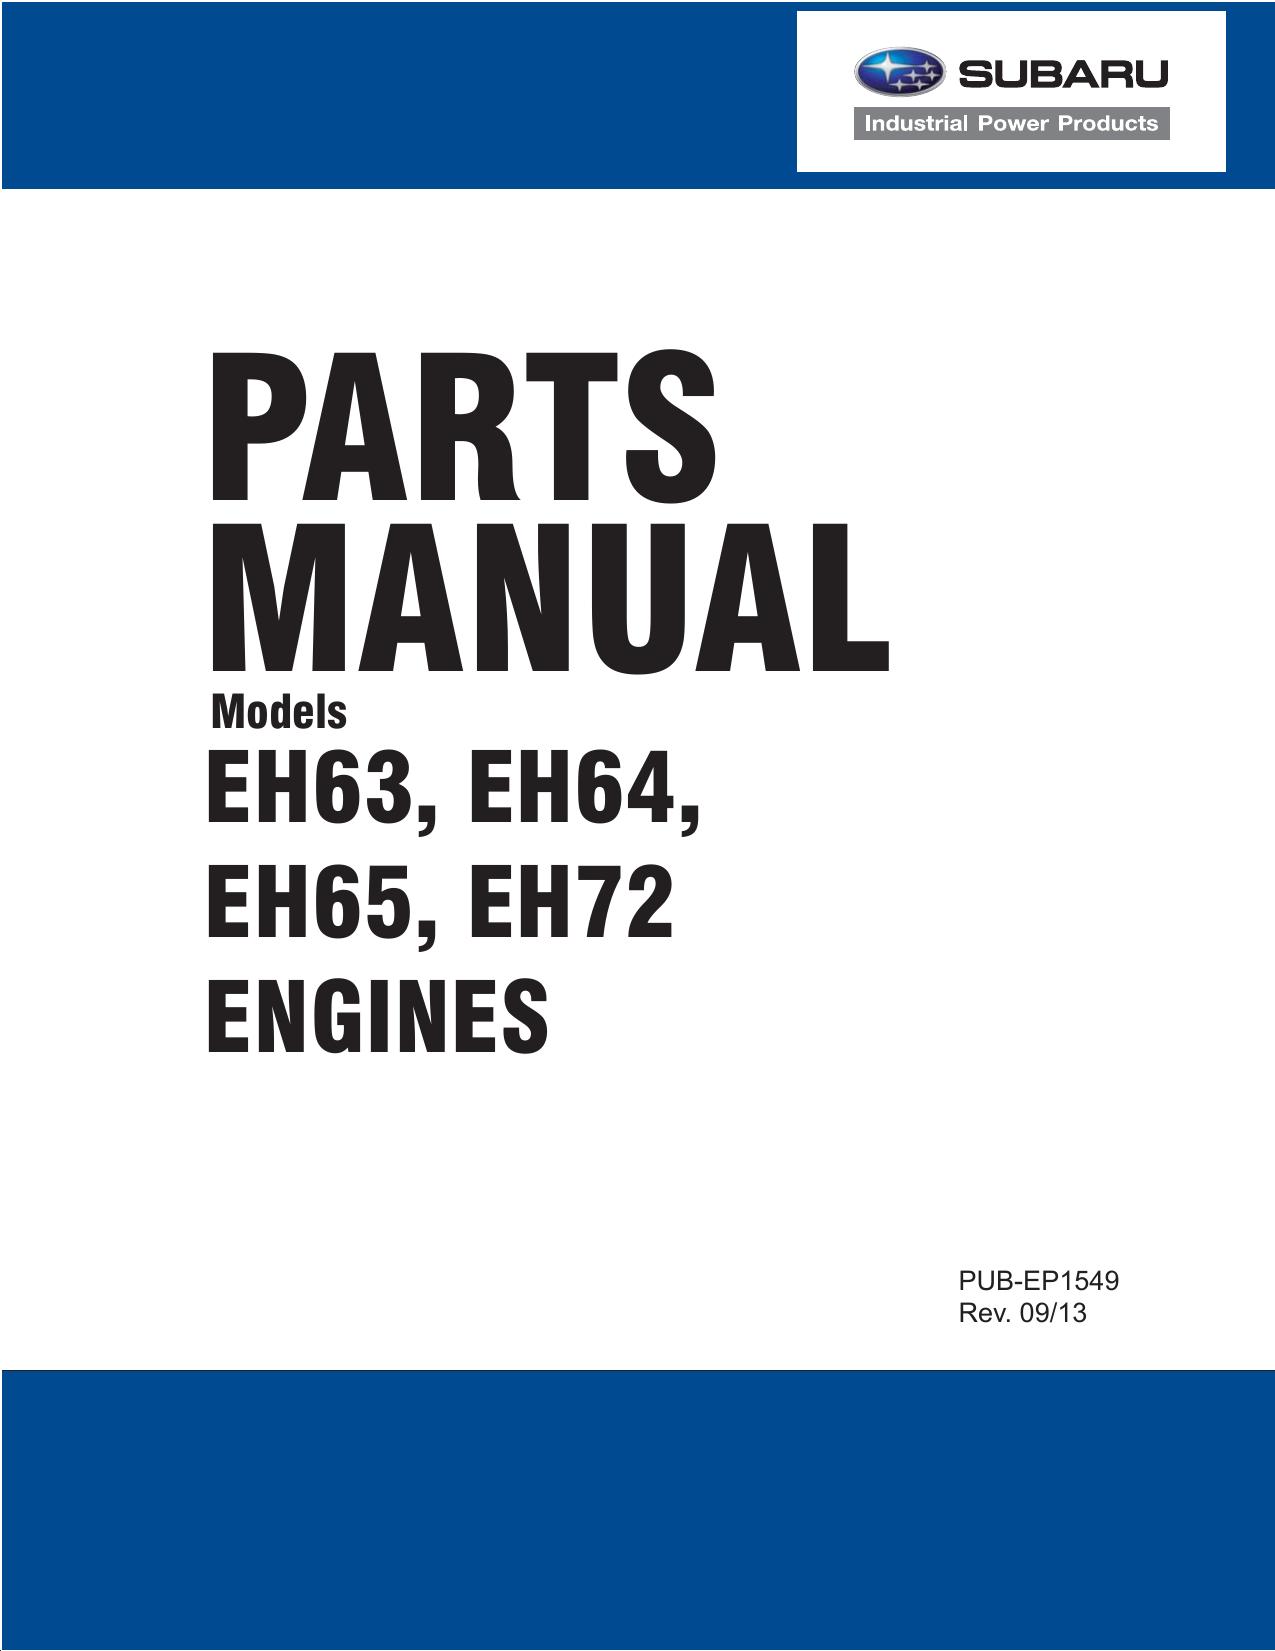 Subaru 653cc Parts Manual Single Barrel Carb Engine Diagram